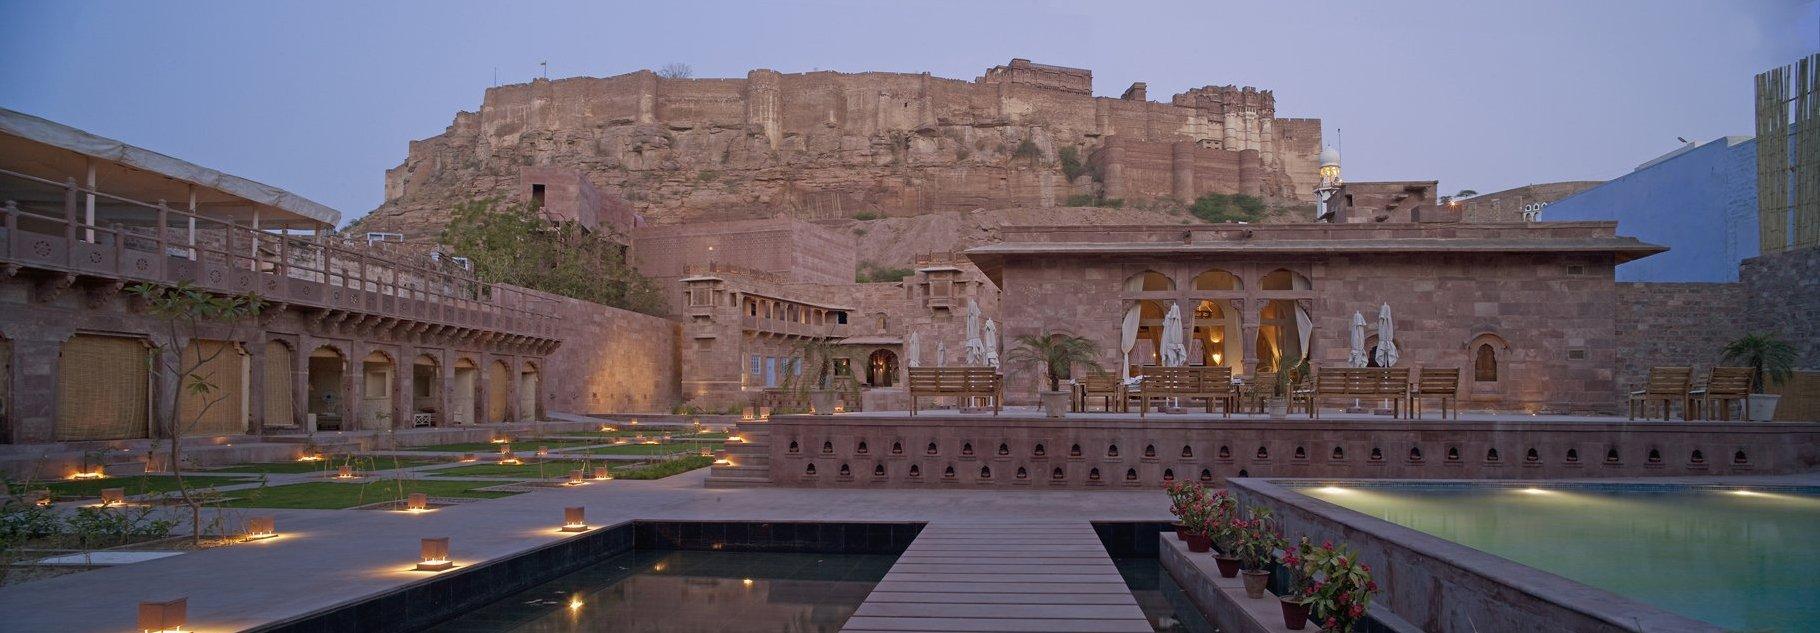 raas-mehrangarh-fort-view-jodhpur